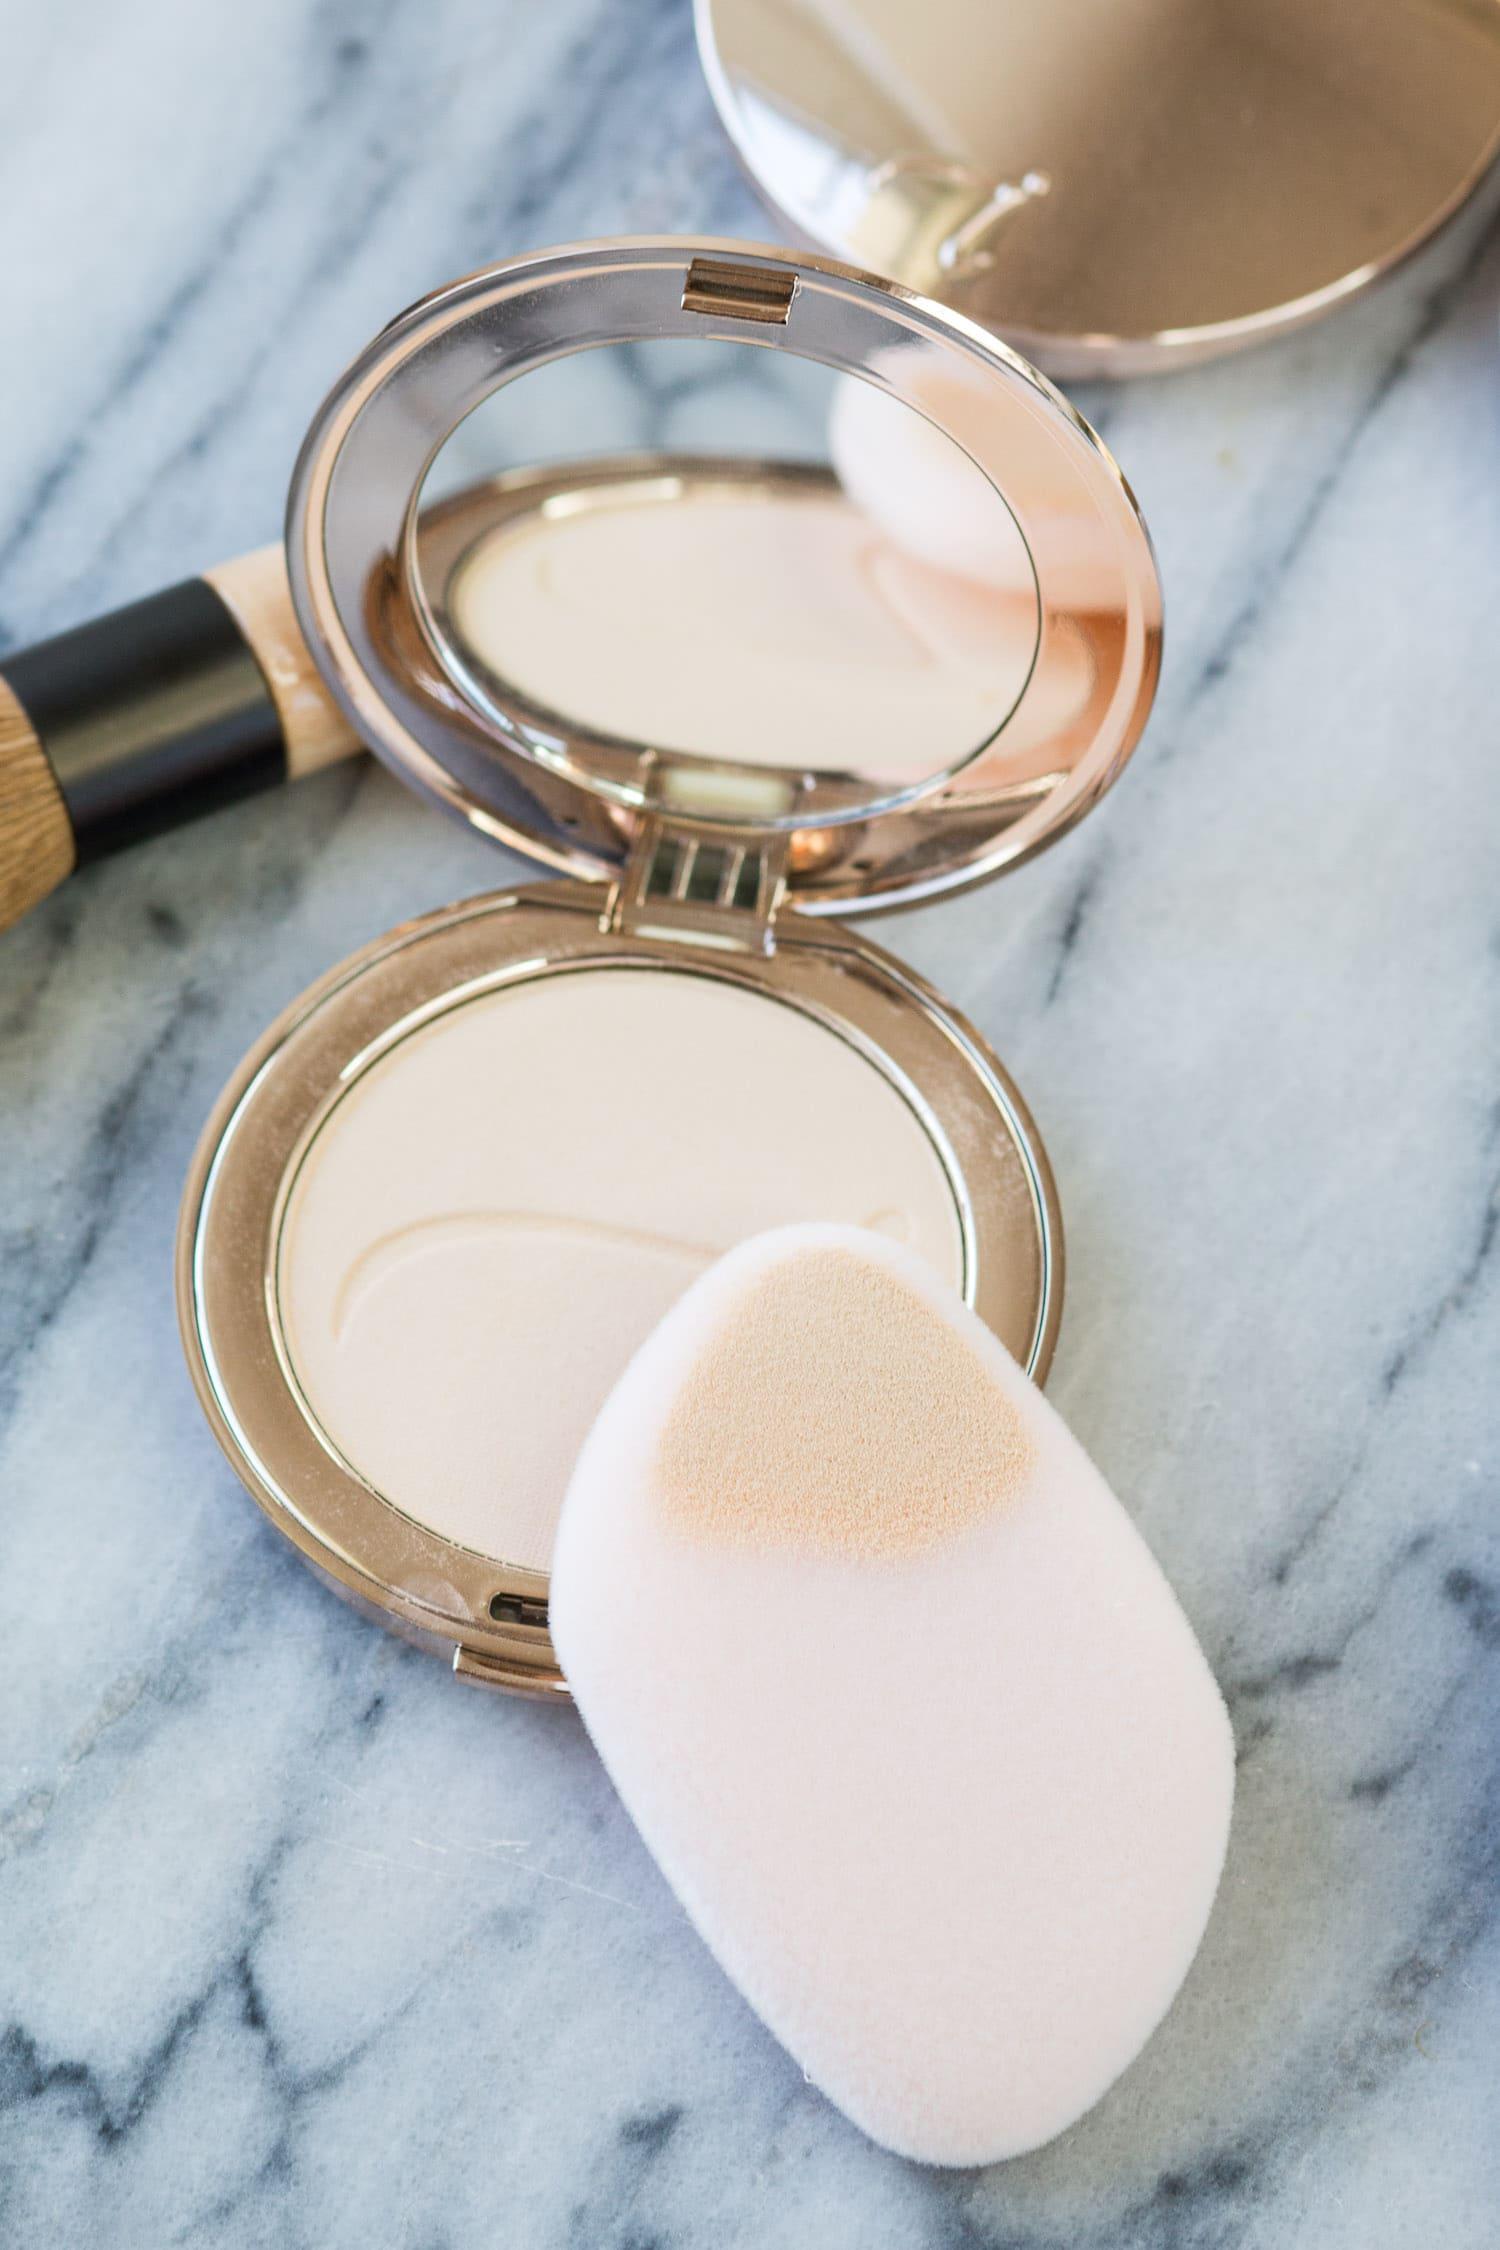 jane-iredale-makeup-tutorial-review-makeup sponge